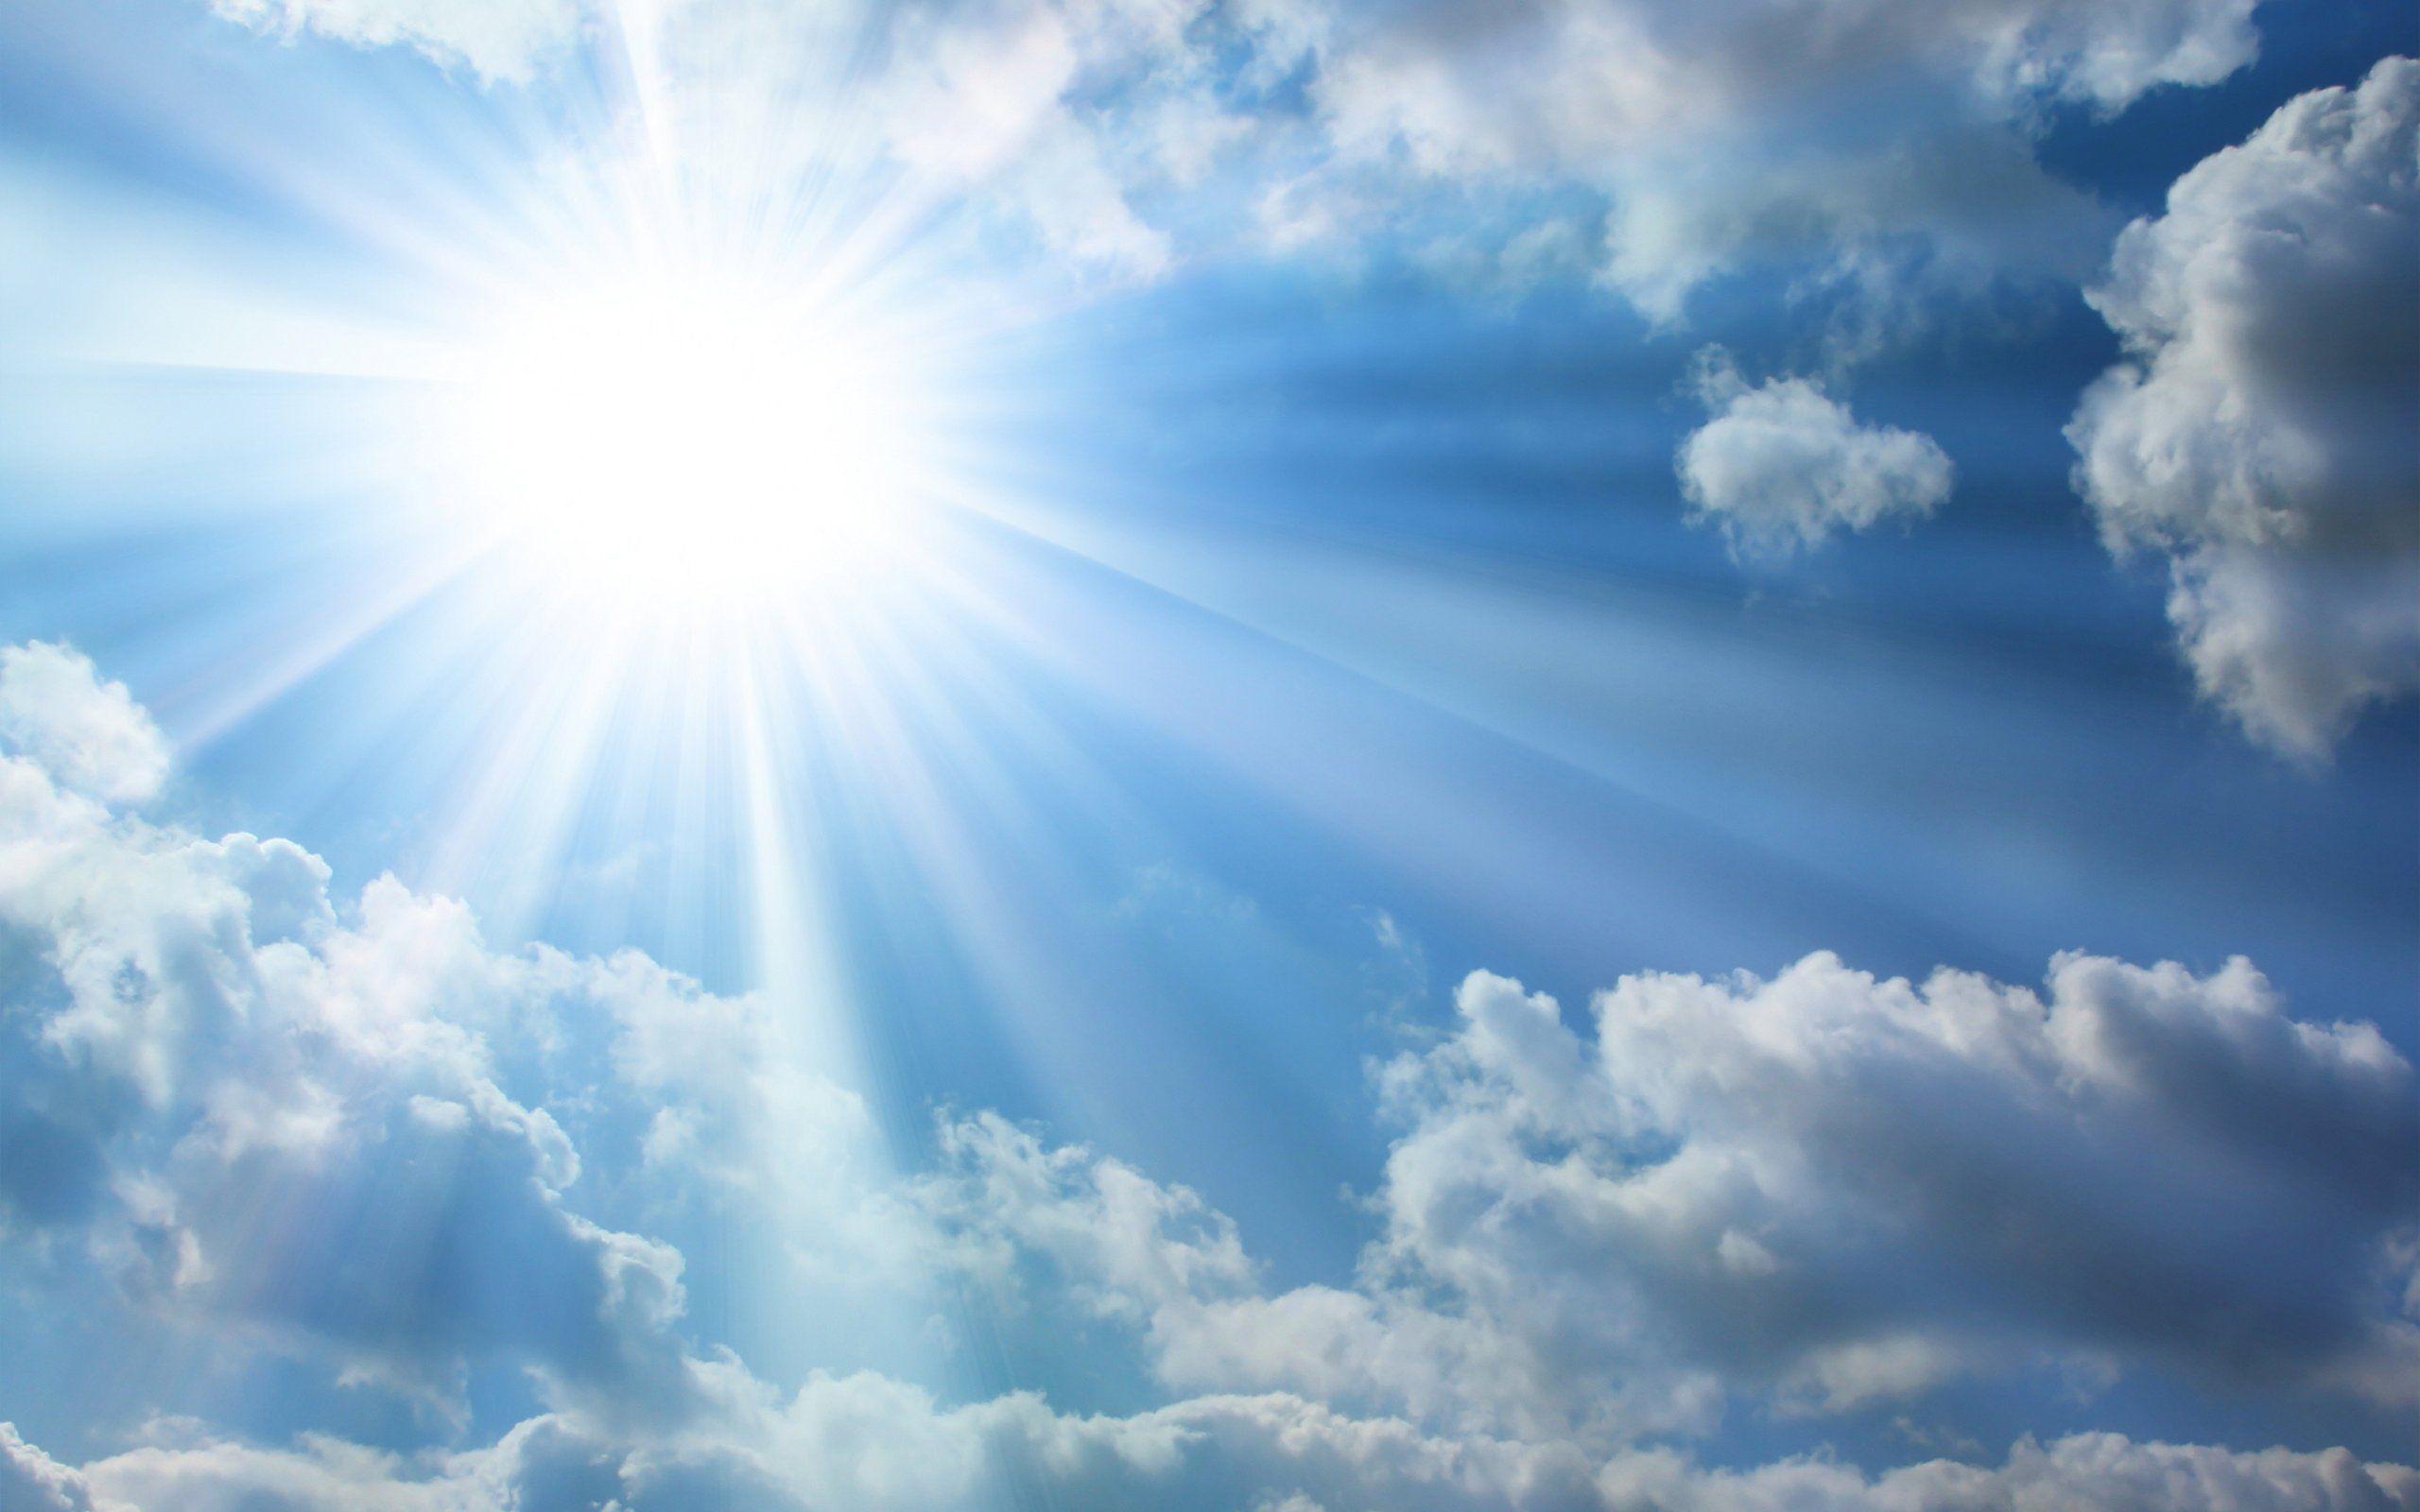 Pin De Teresa Rieno Mbila En Wolkensonnesturmgewitter Cielo Con Nubes Cielo Nubes